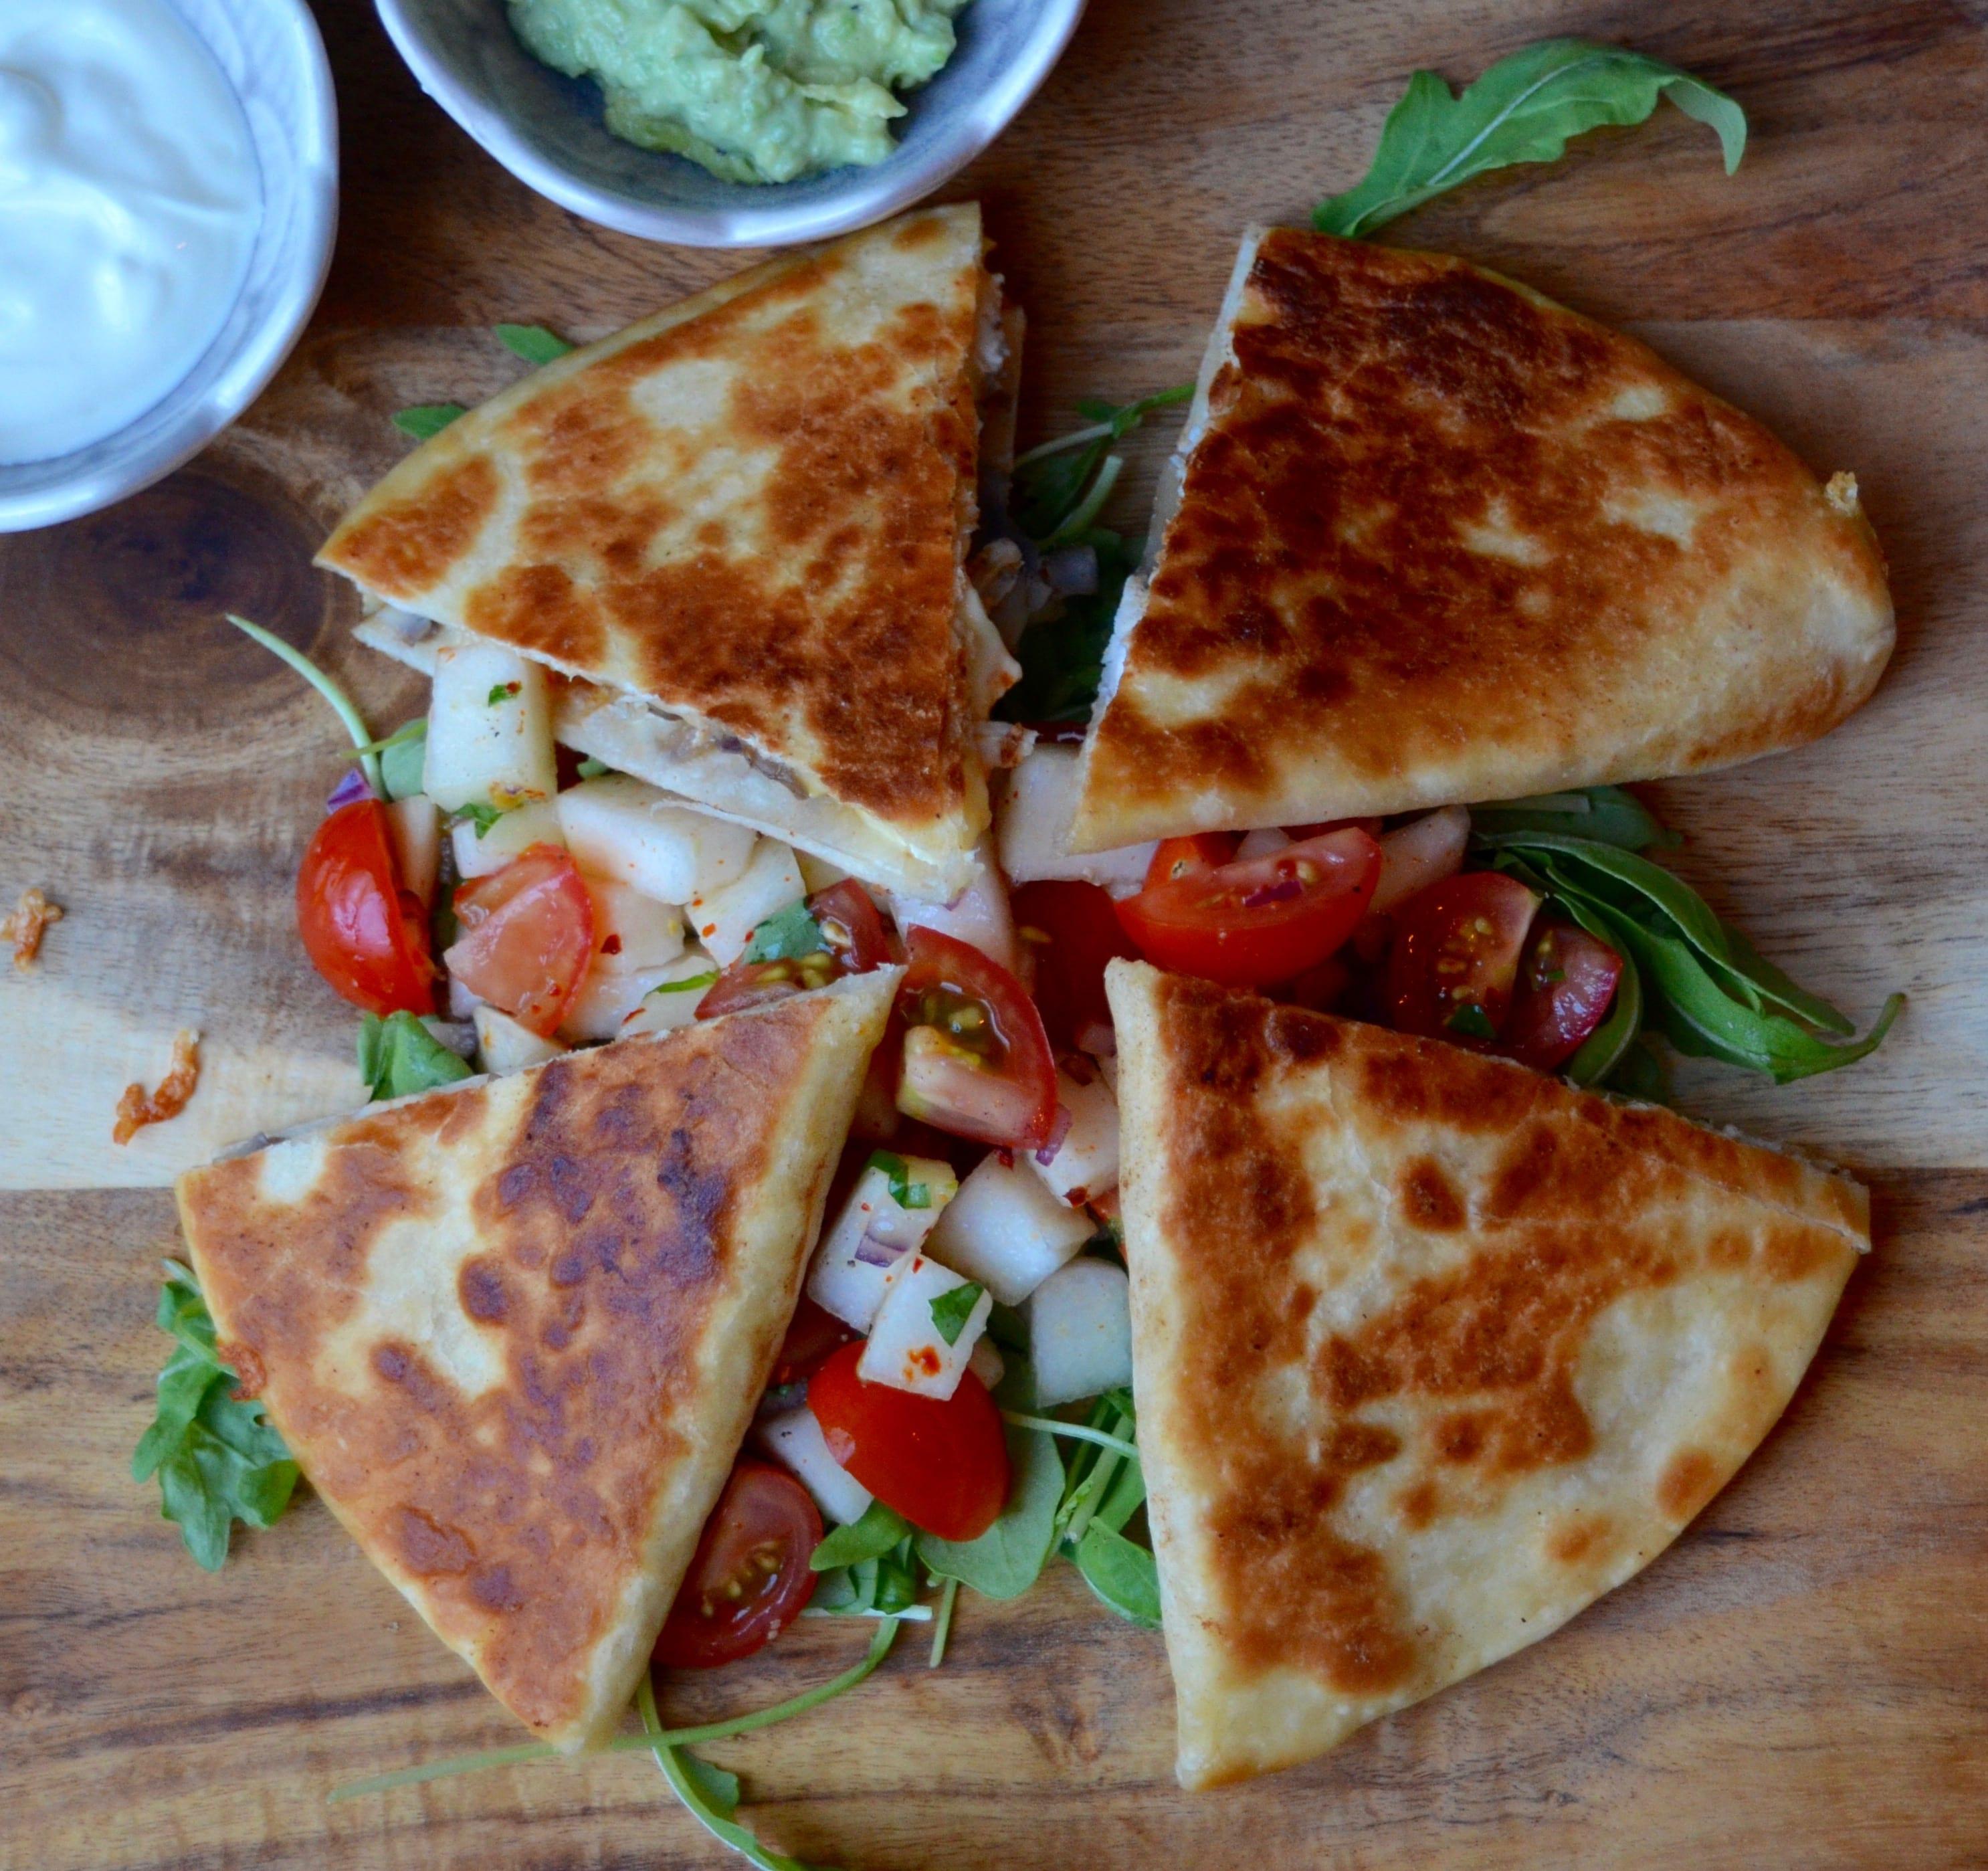 Stökkar Quesadillas með kjúklingi og camembert osti